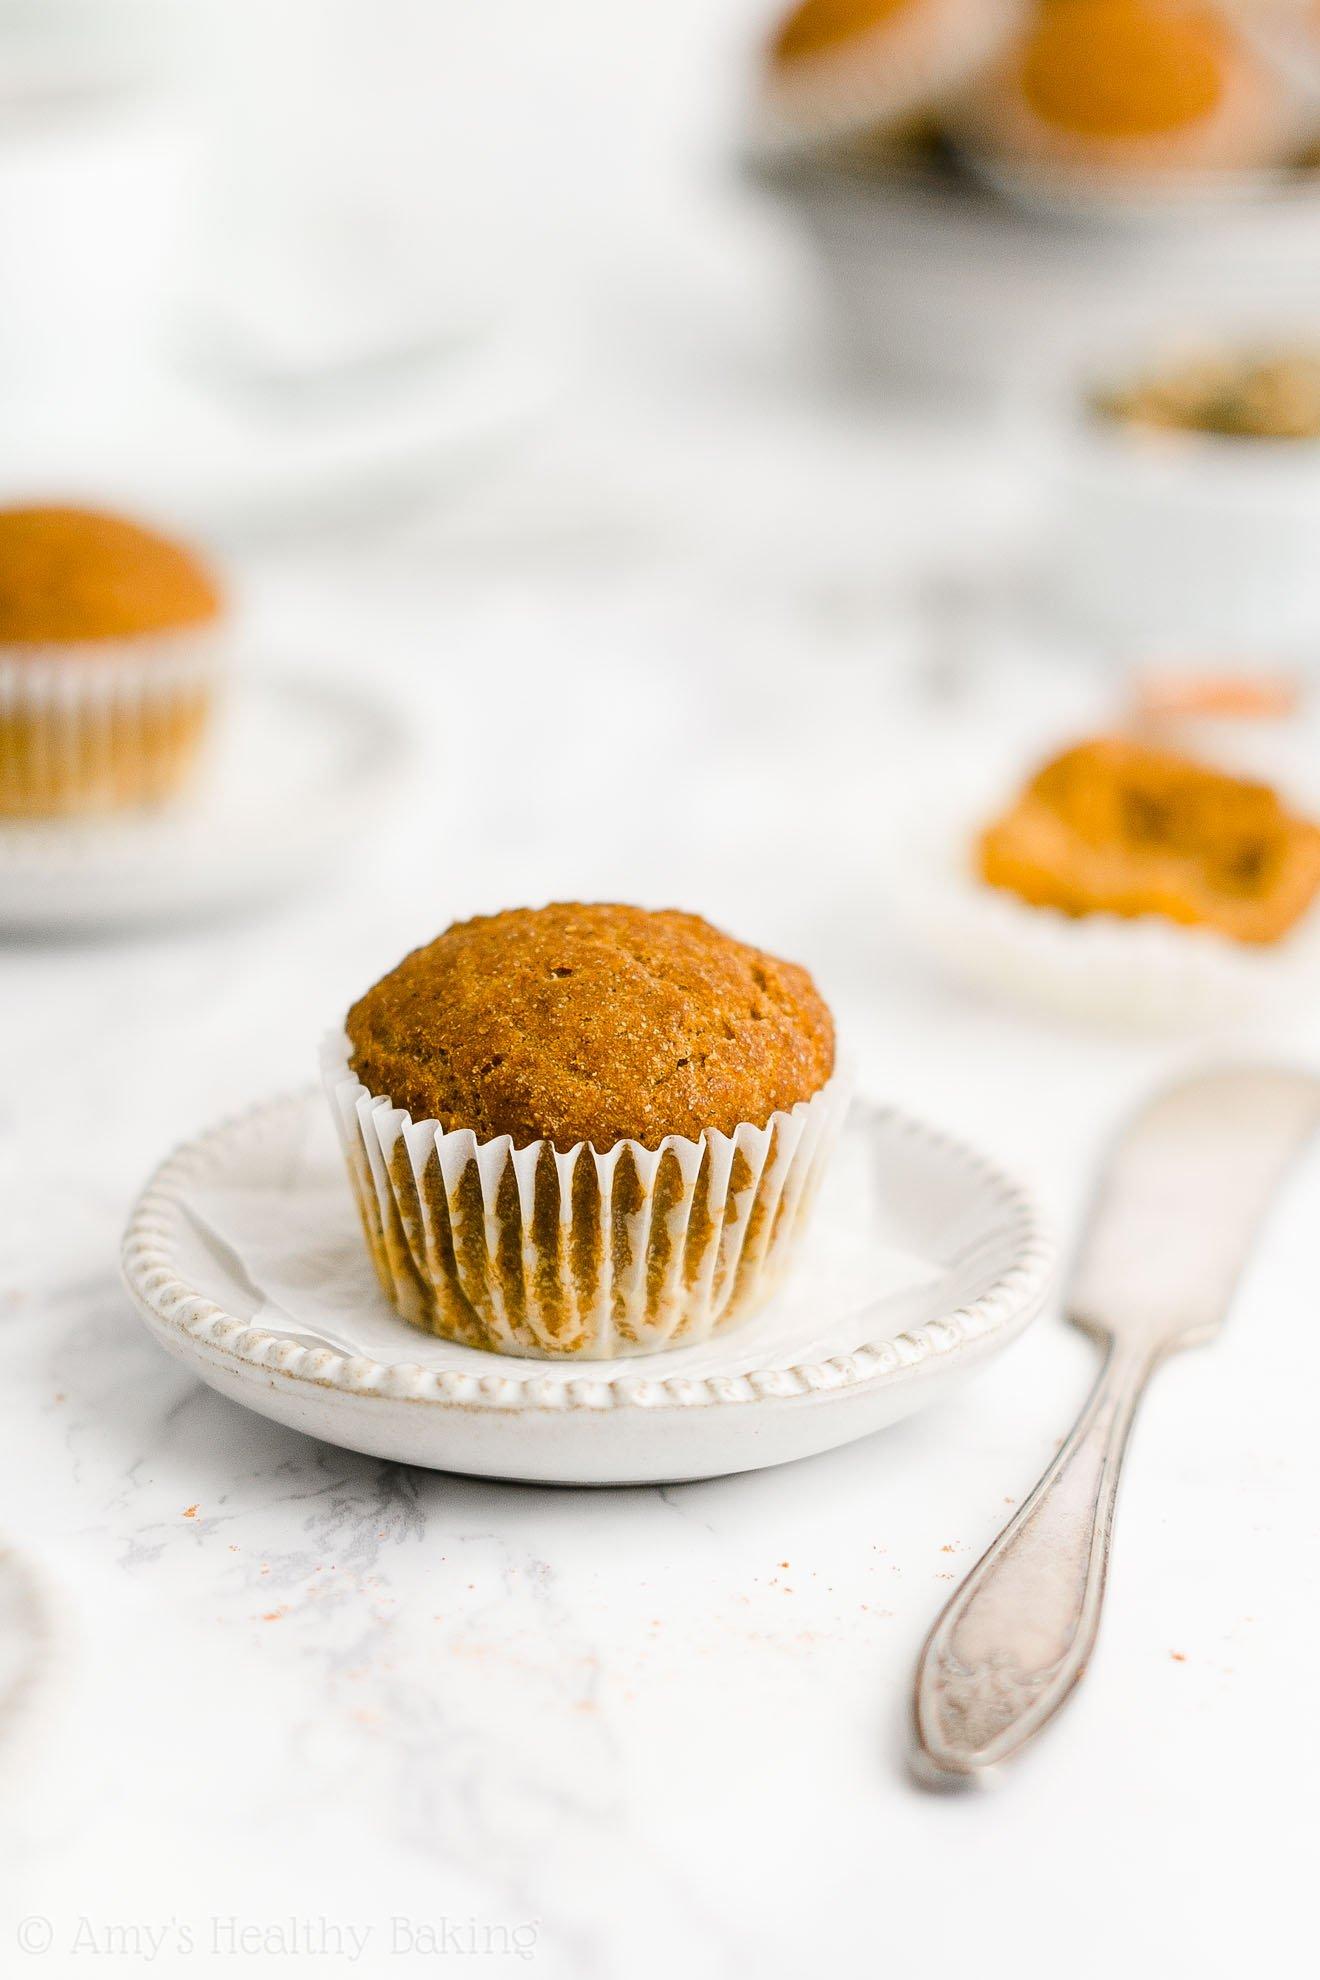 ULTIMATE Best Easy Healthy Low Fat Weight Watchers Pumpkin Muffins